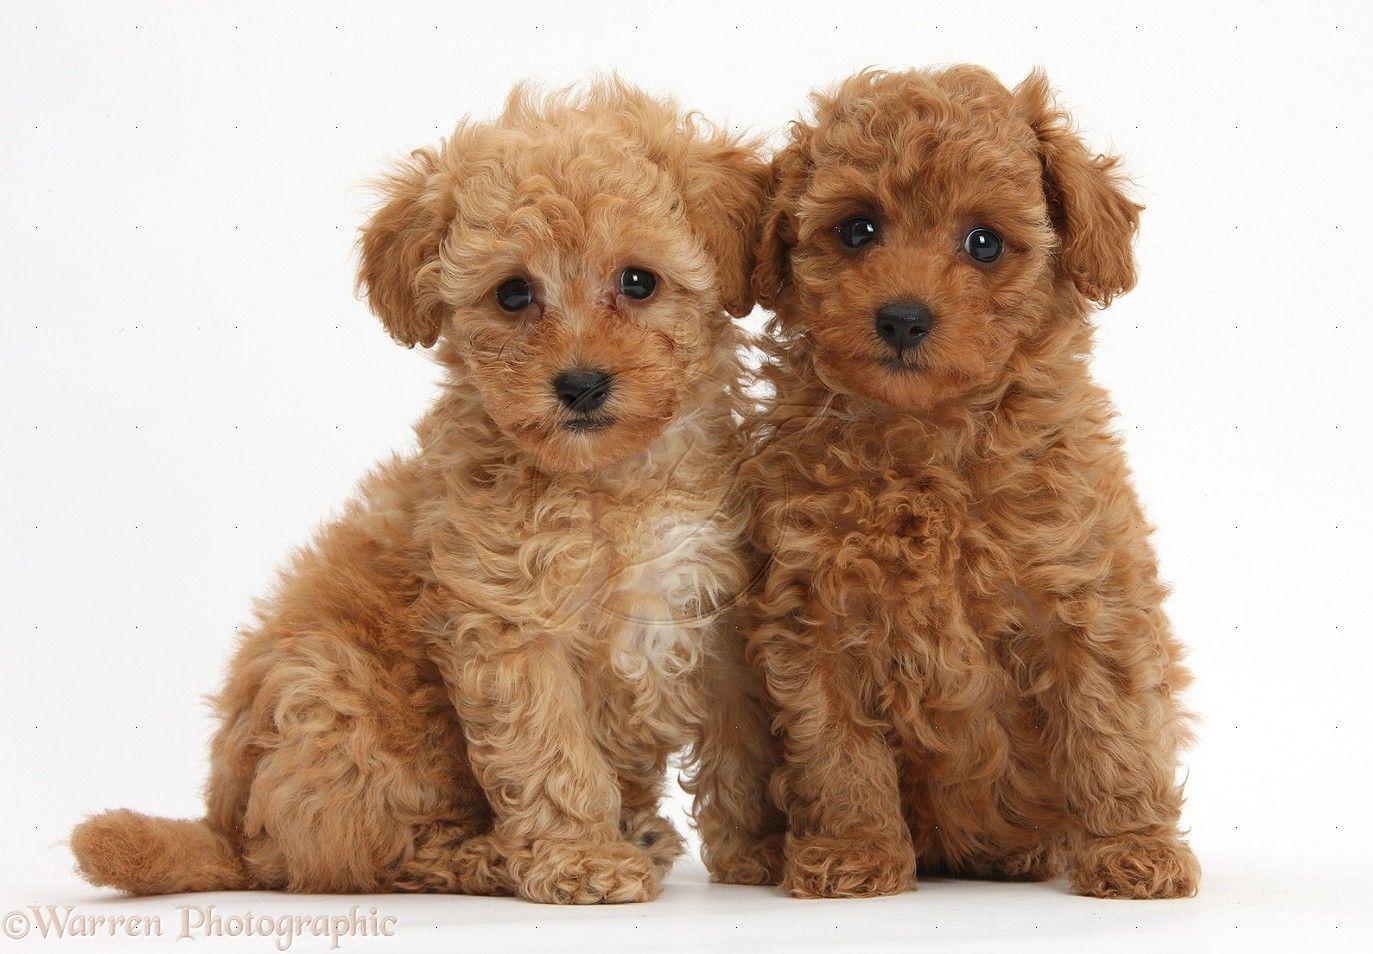 Cute Toy Poodle Puppies Toy Poodle Puppies Toy Dog Breeds